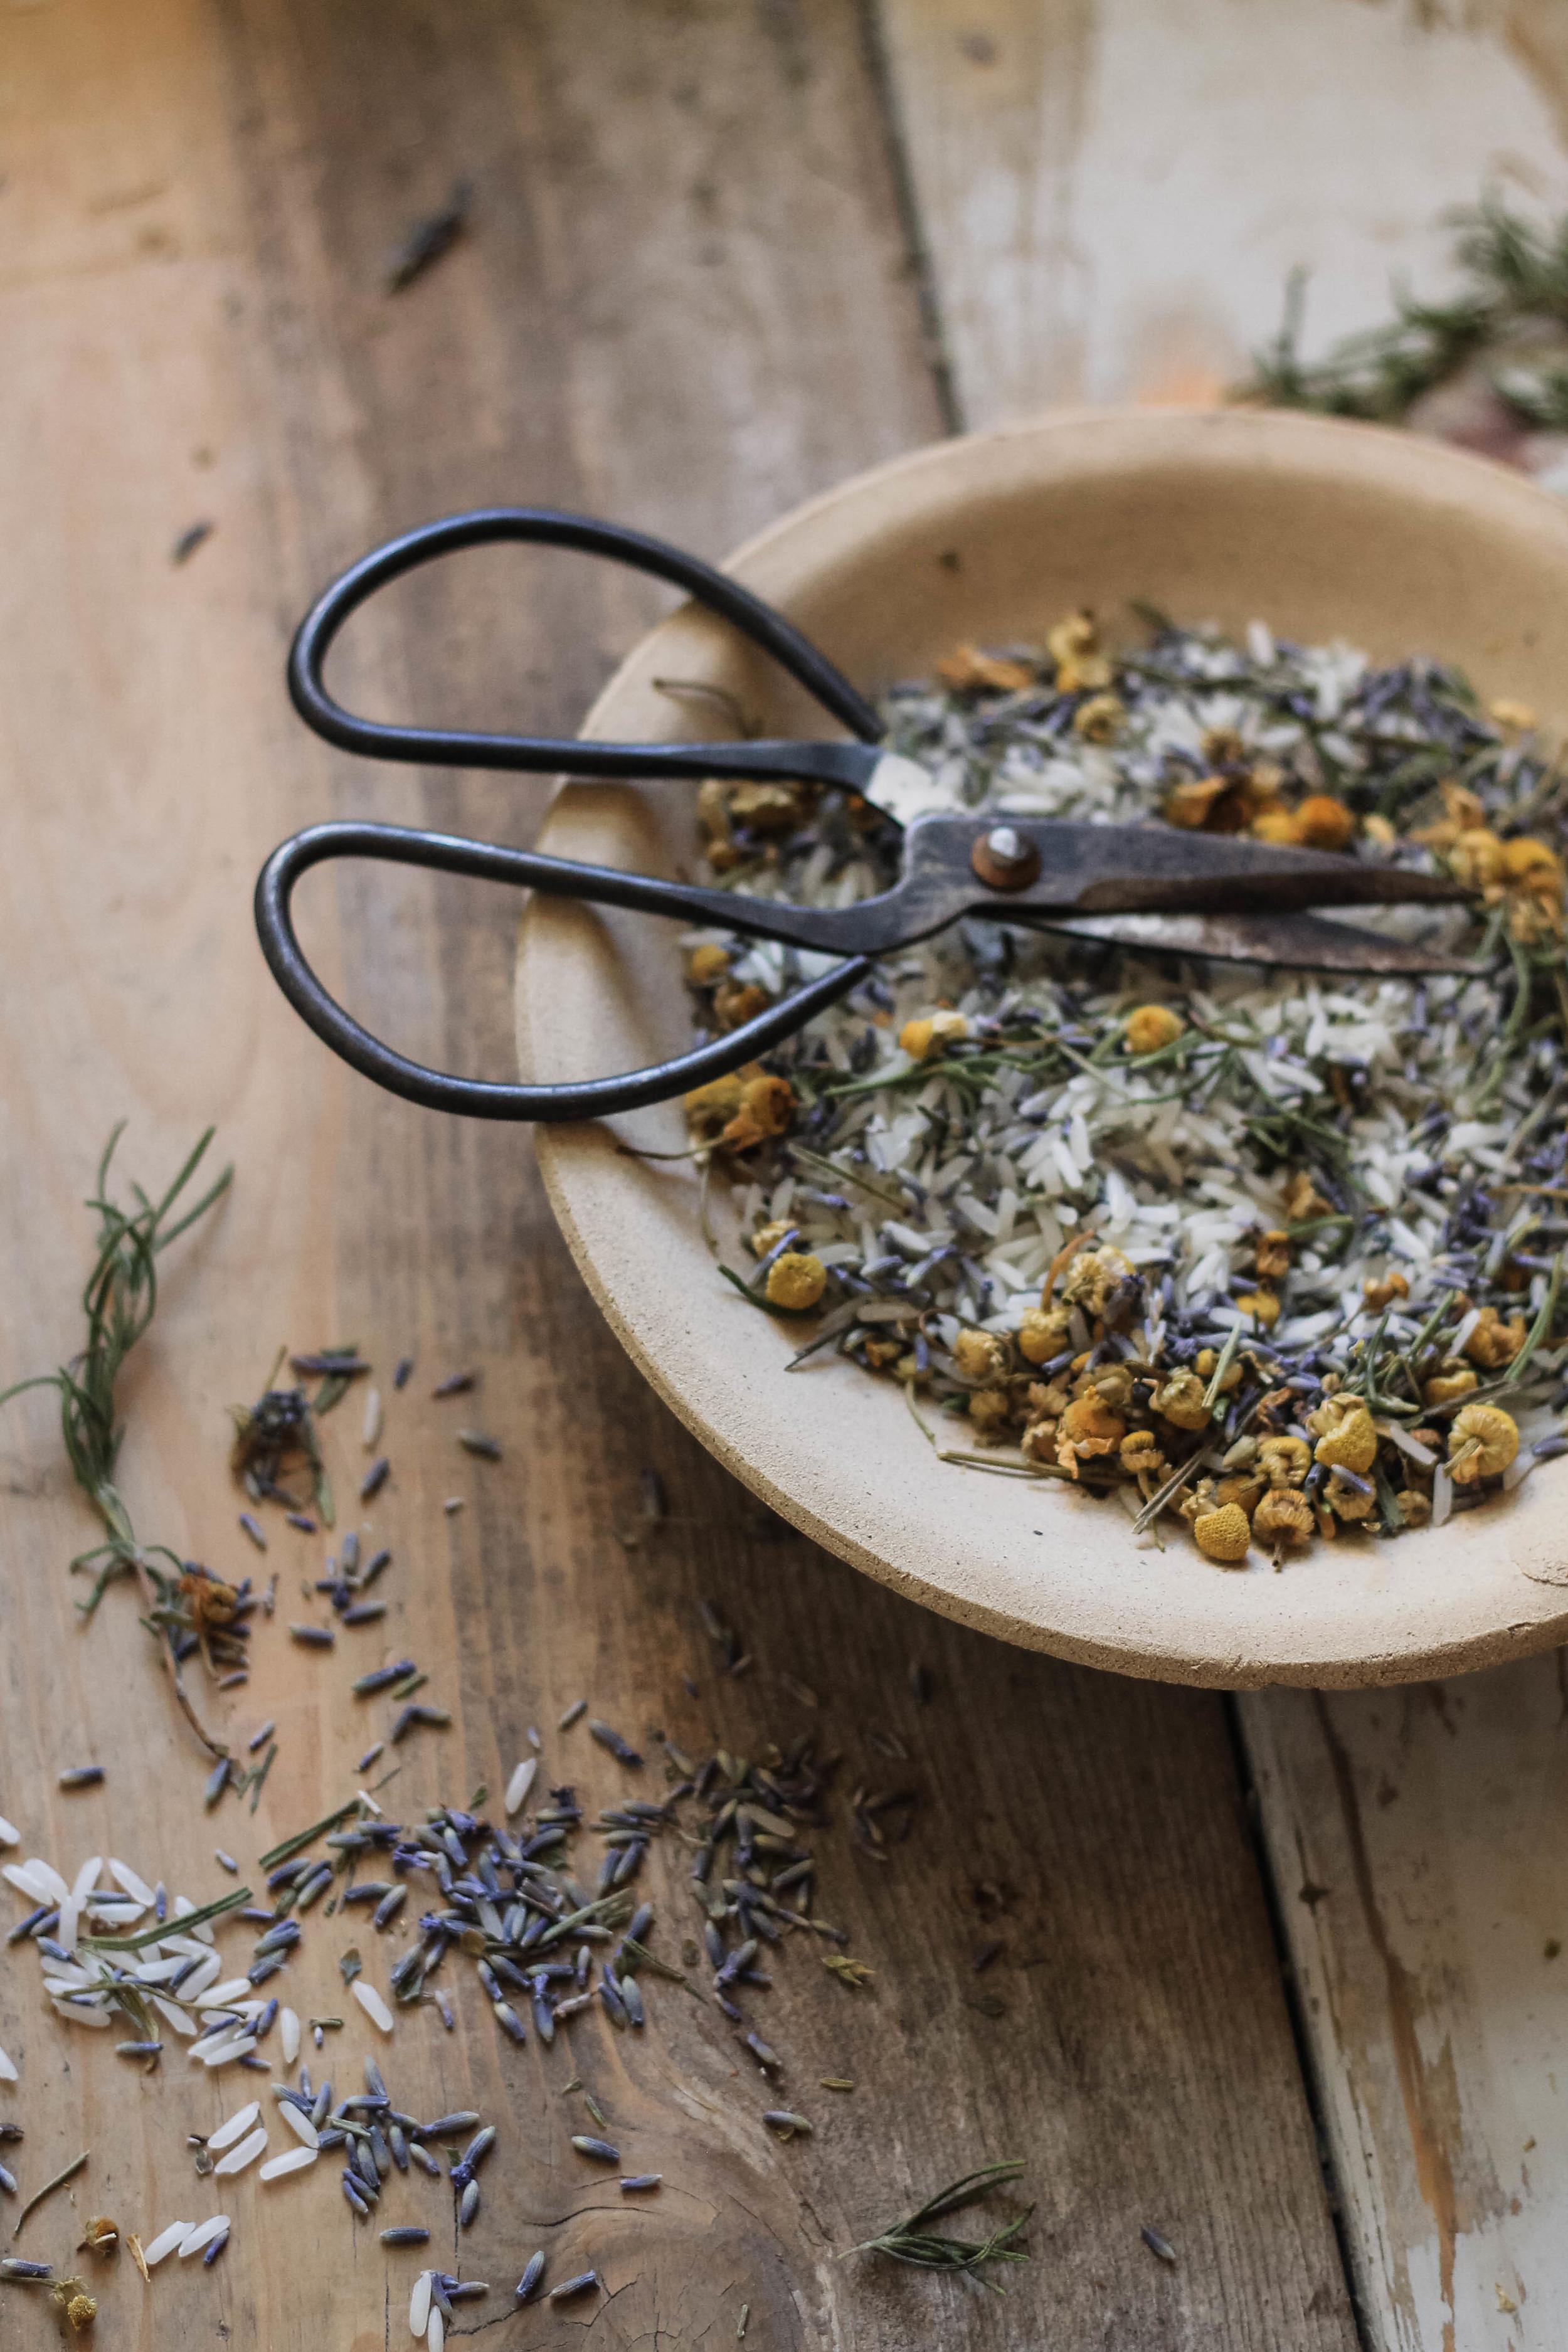 diy lavender & chamomile sachets | via: bekuh b.